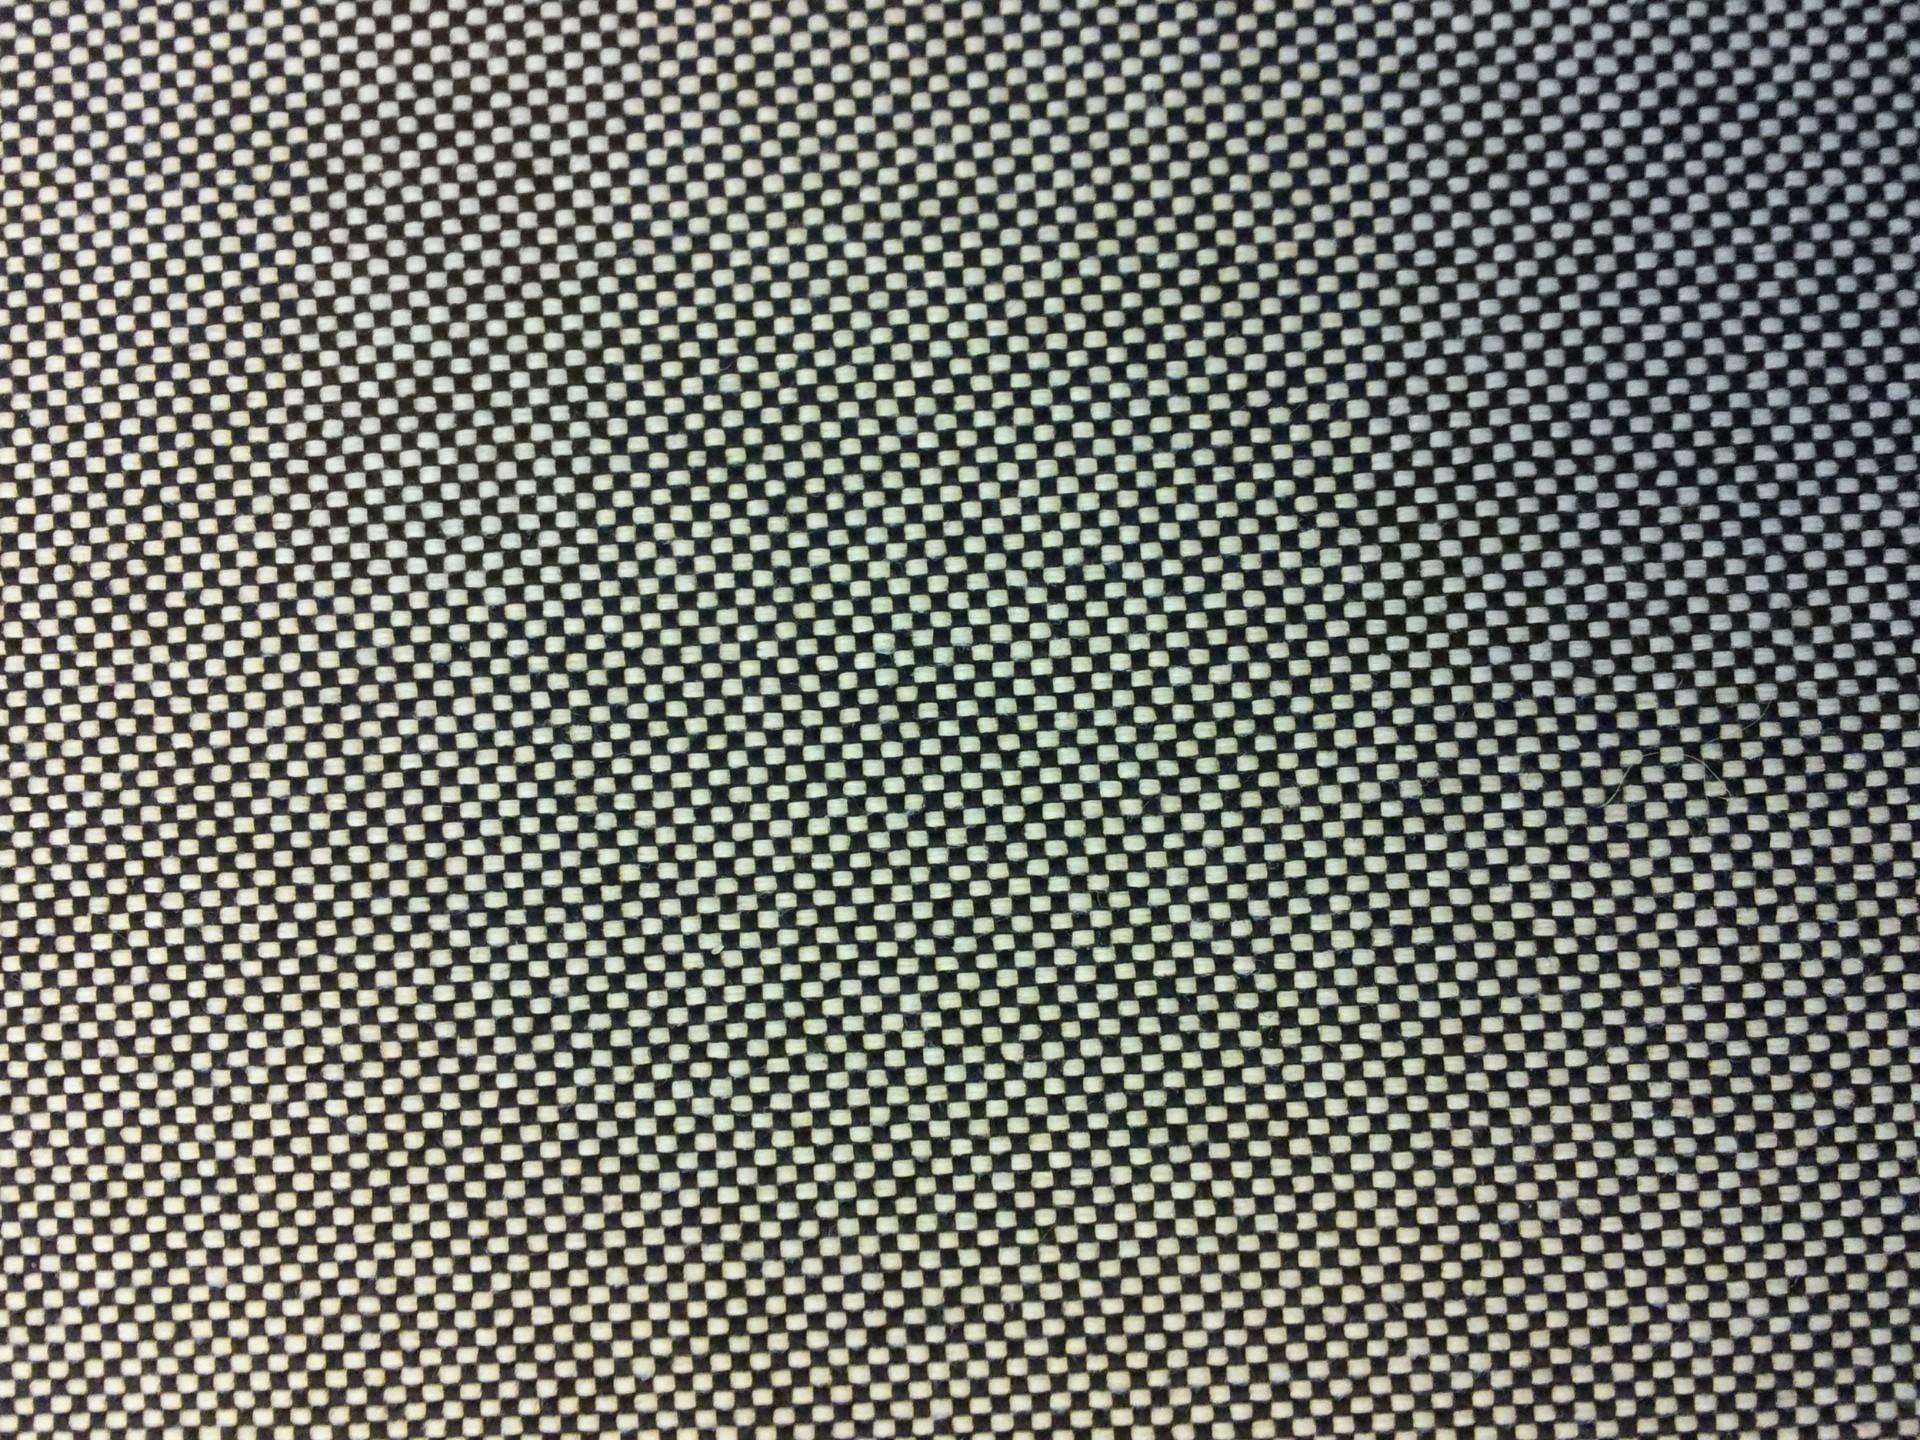 White Dot Texture Wallpaper